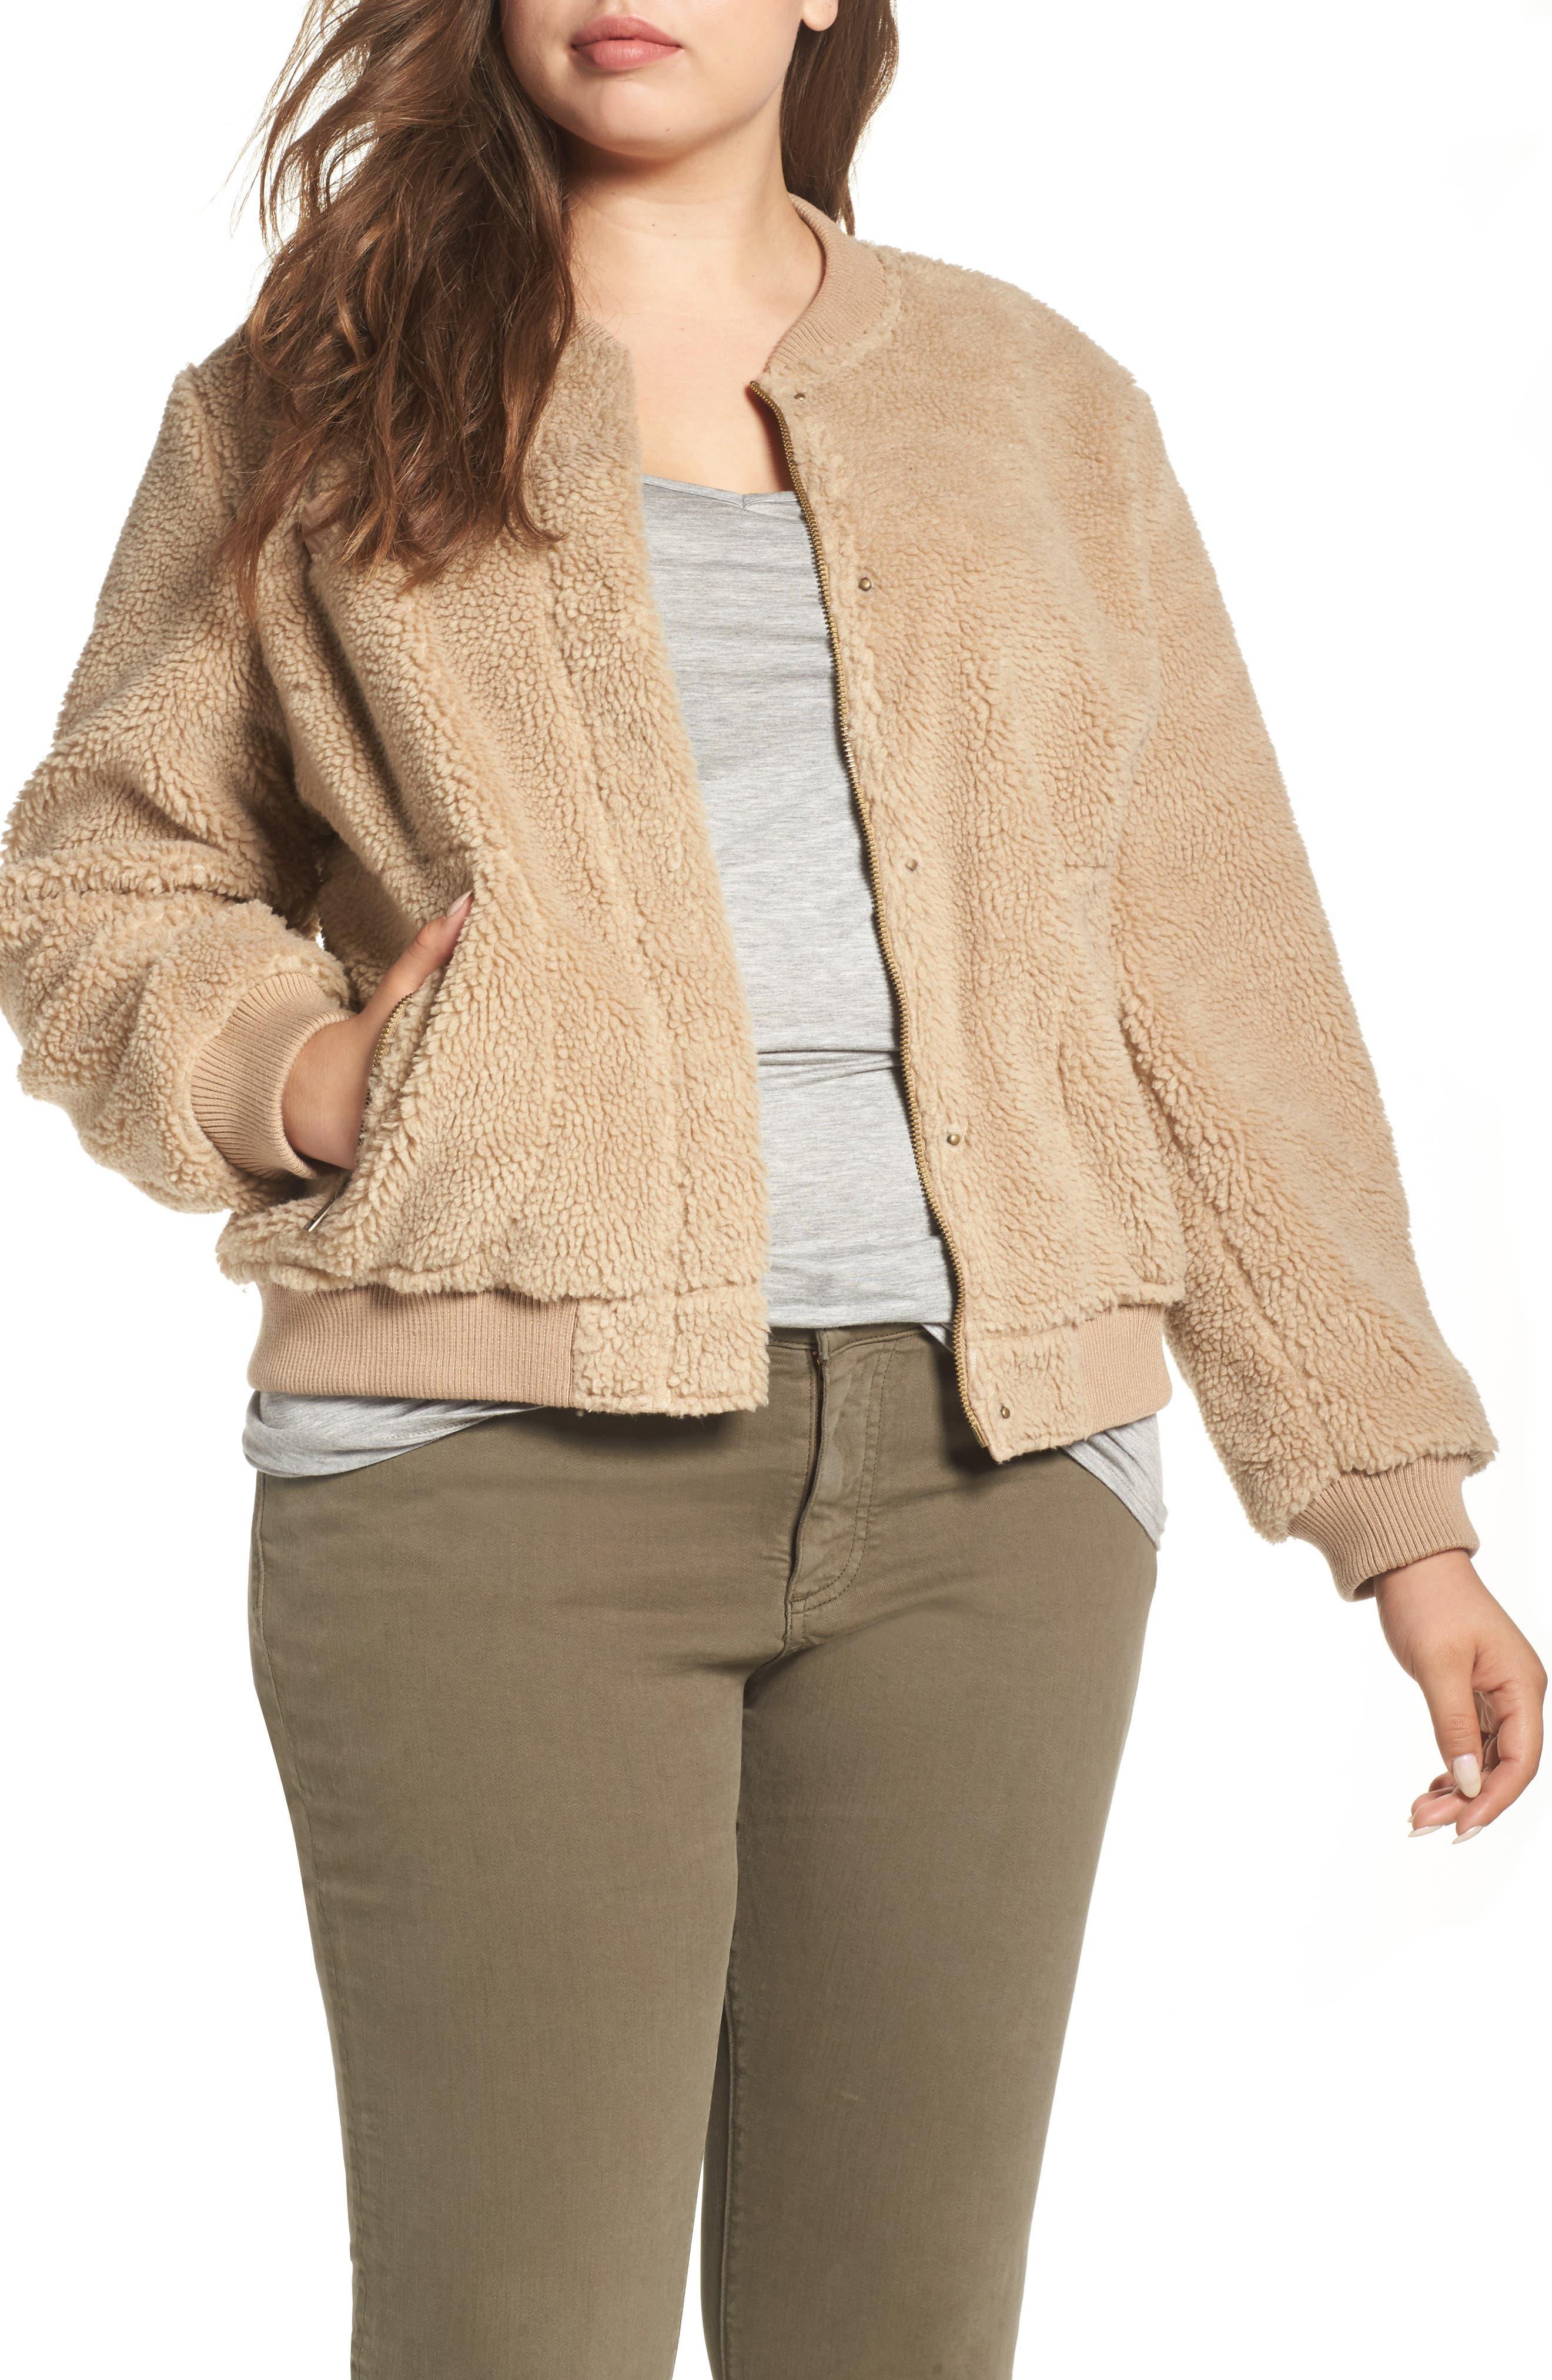 Alternate Image 1 Selected - Levi's® Rib Knit Fleece Bomber Jacket